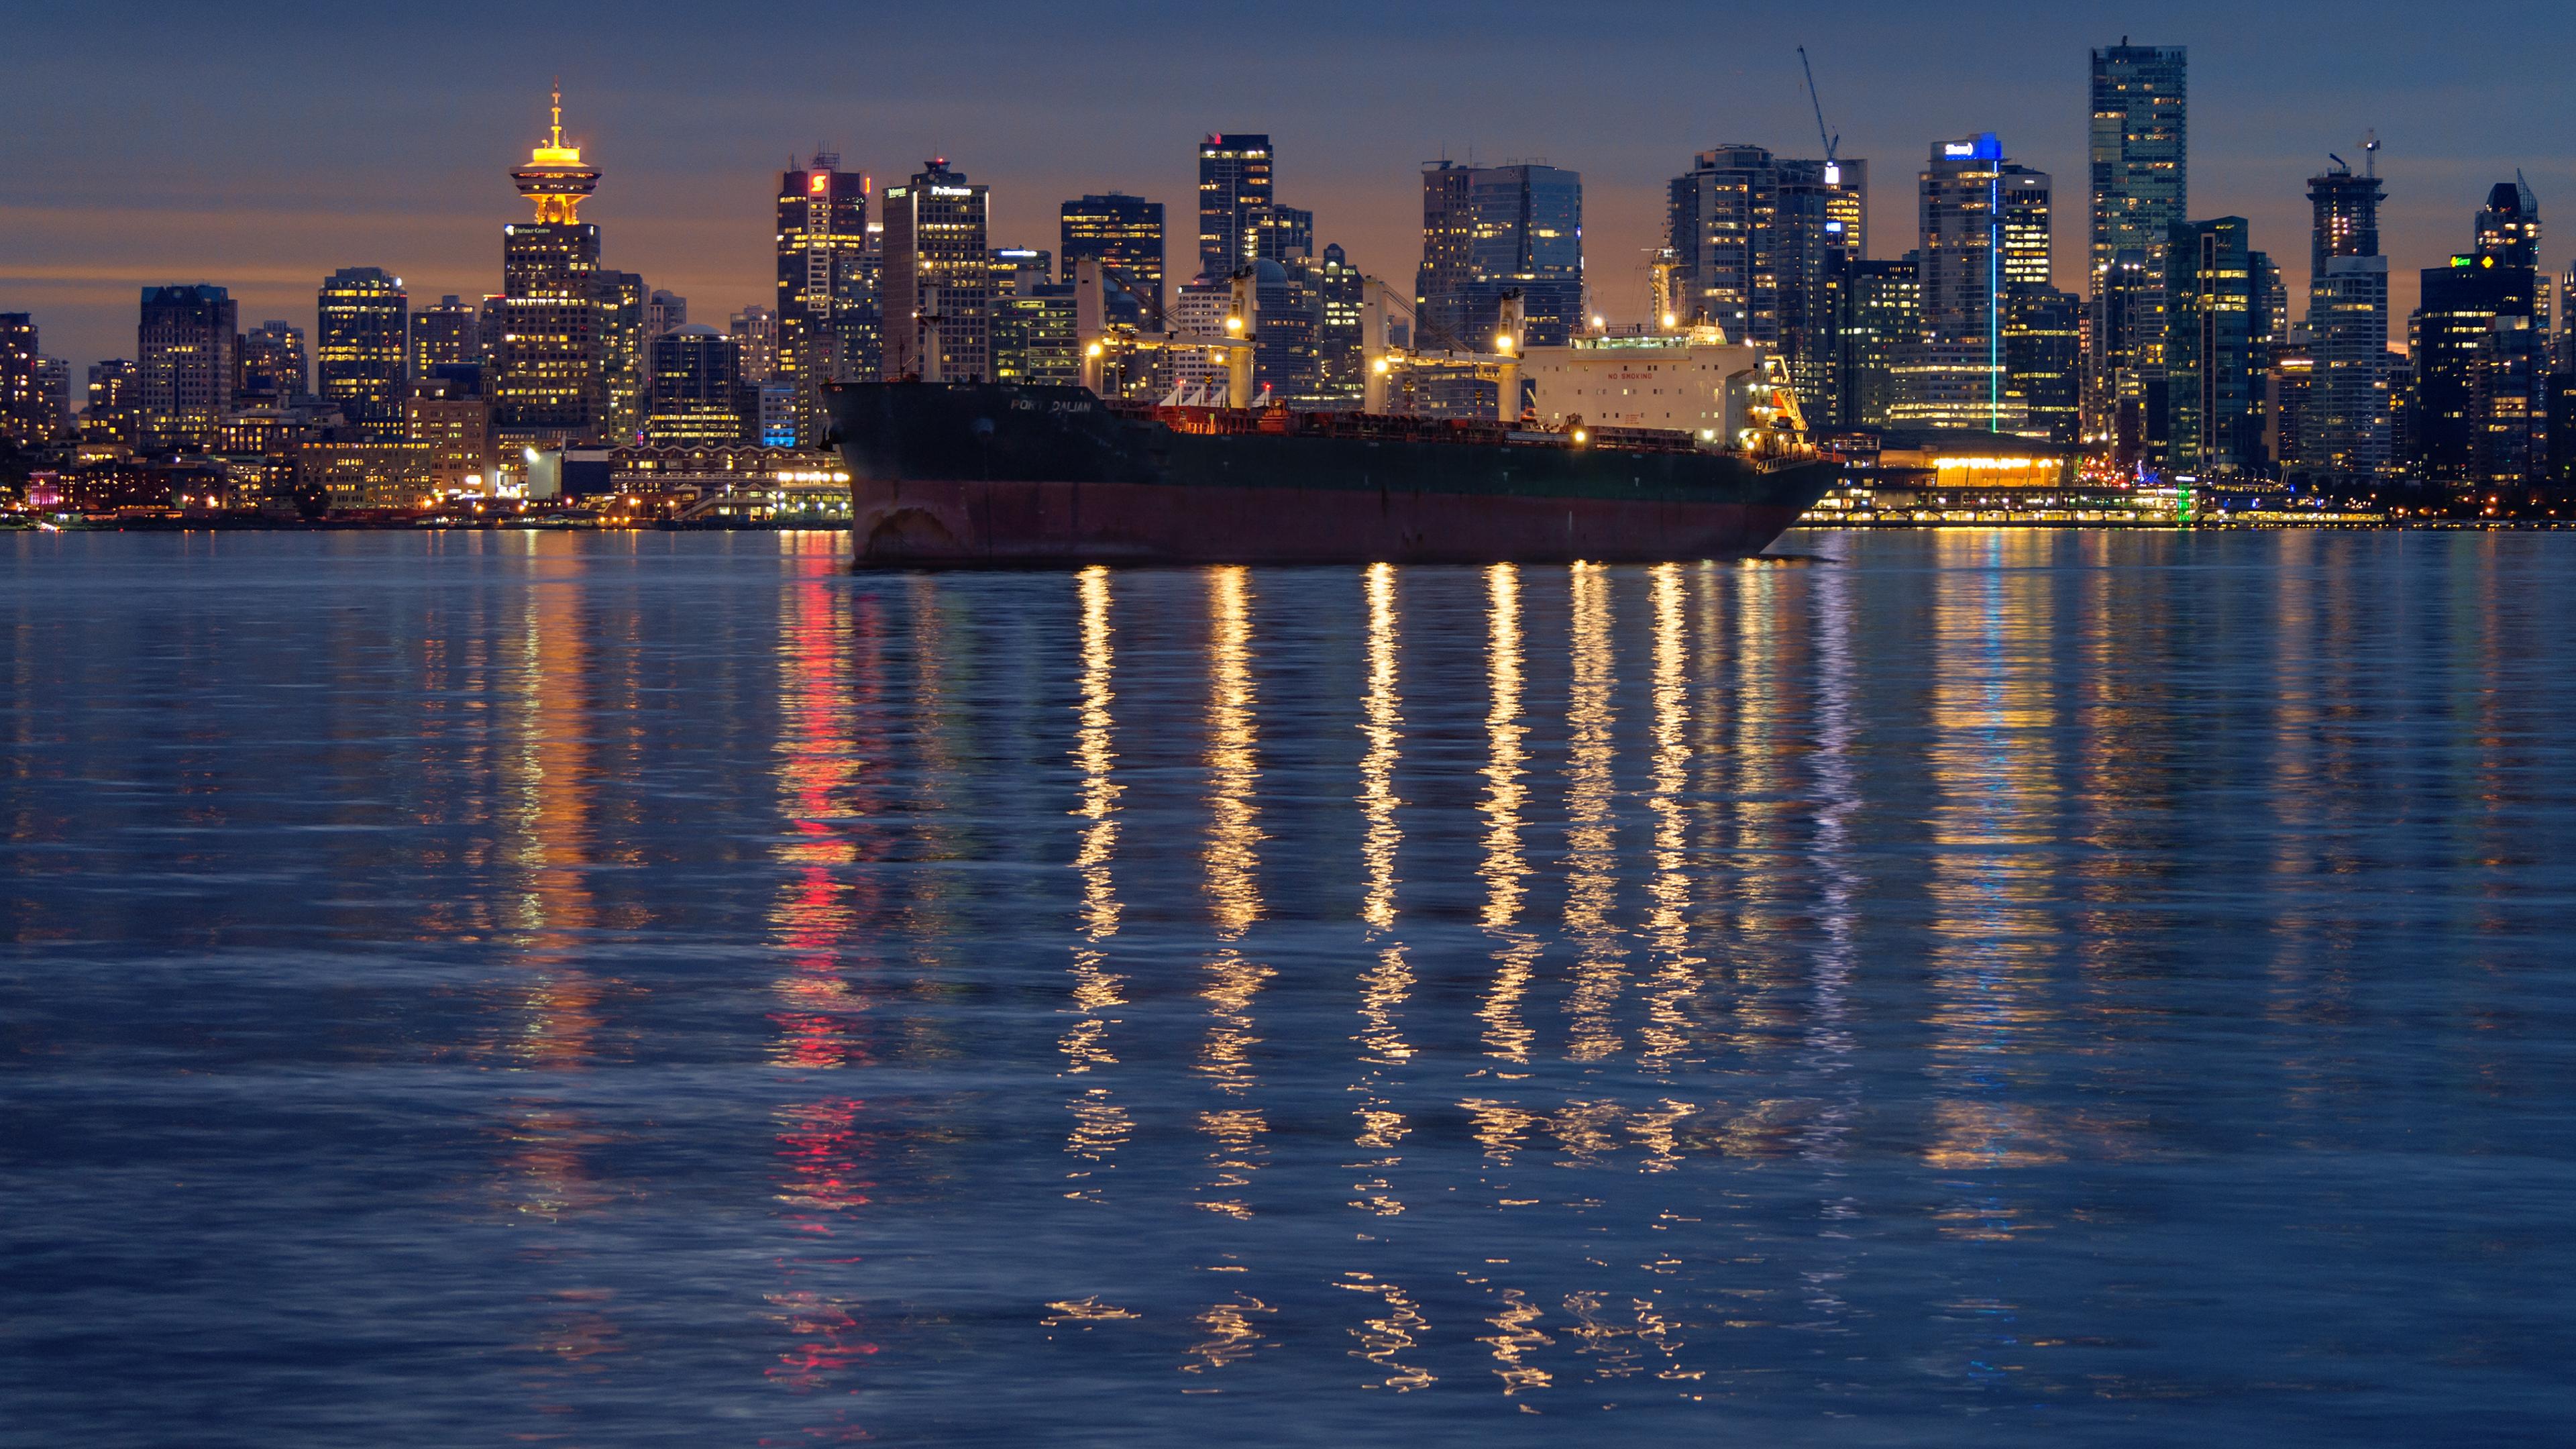 страны архитектура корабли река Канада Ванкувер загрузить